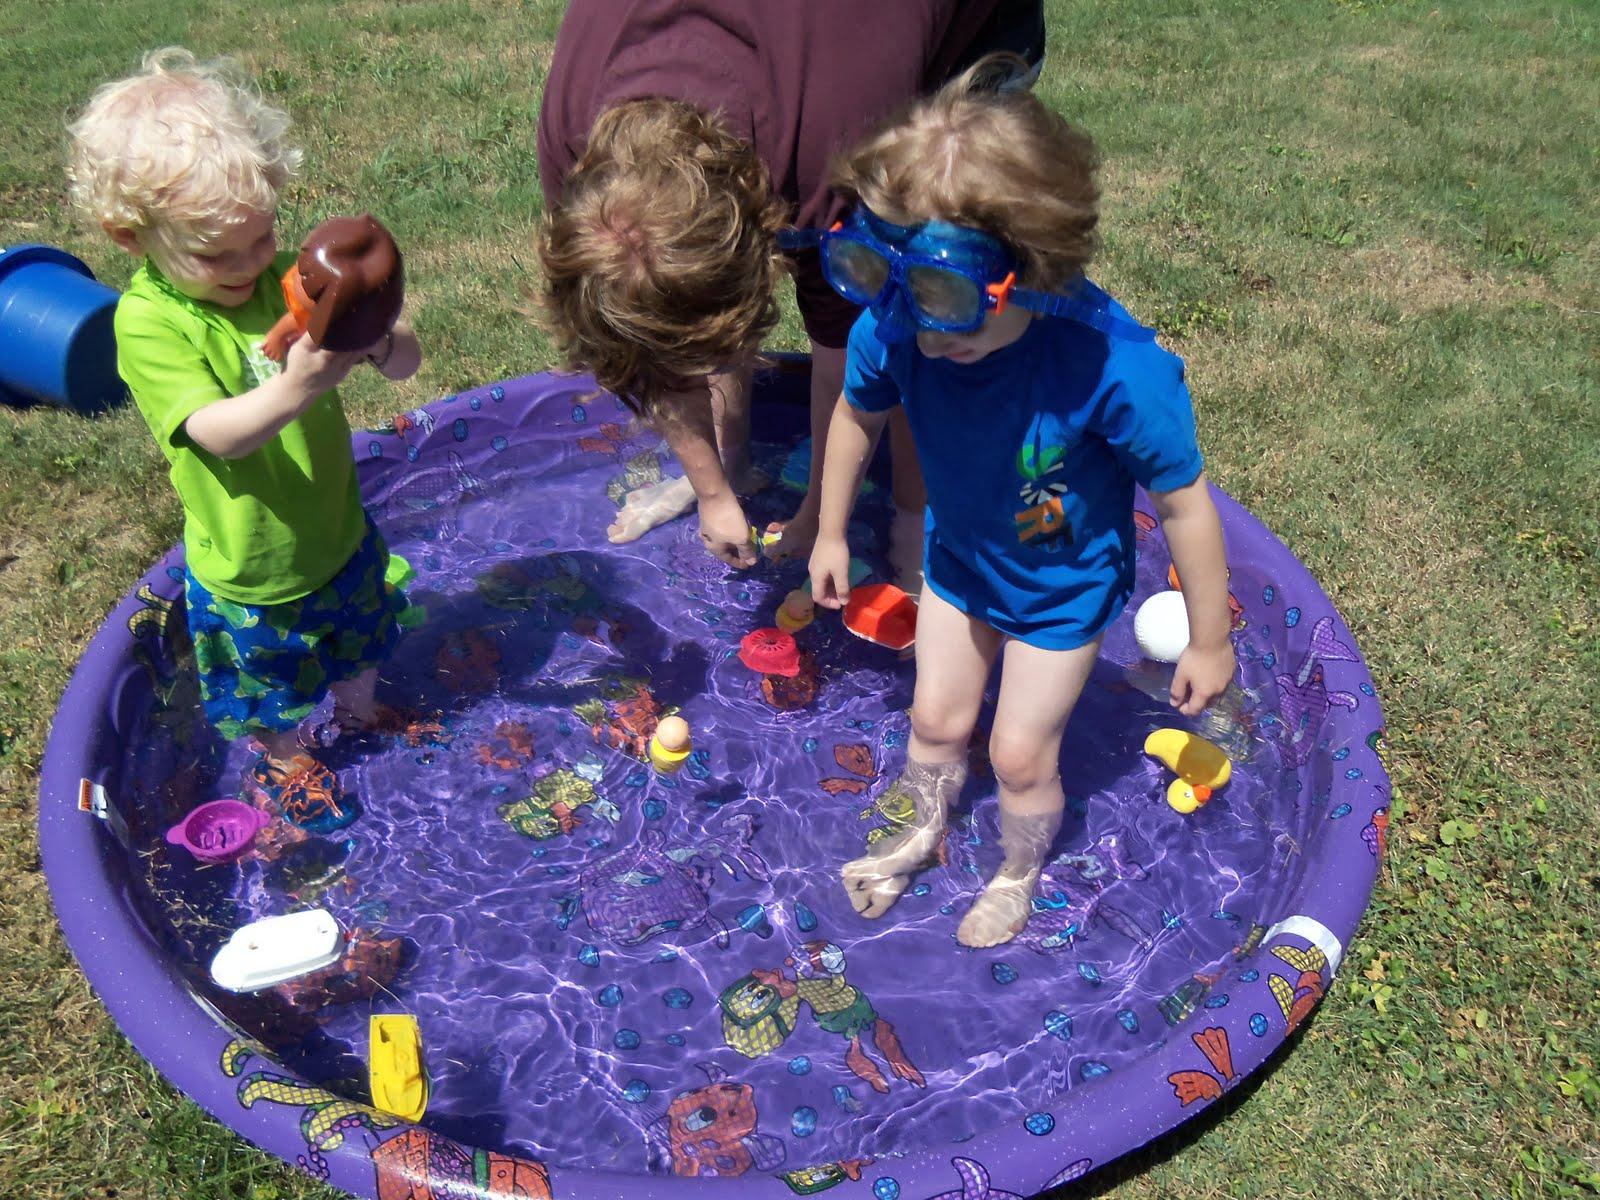 homeschooling special kids backyard water fun and trip to